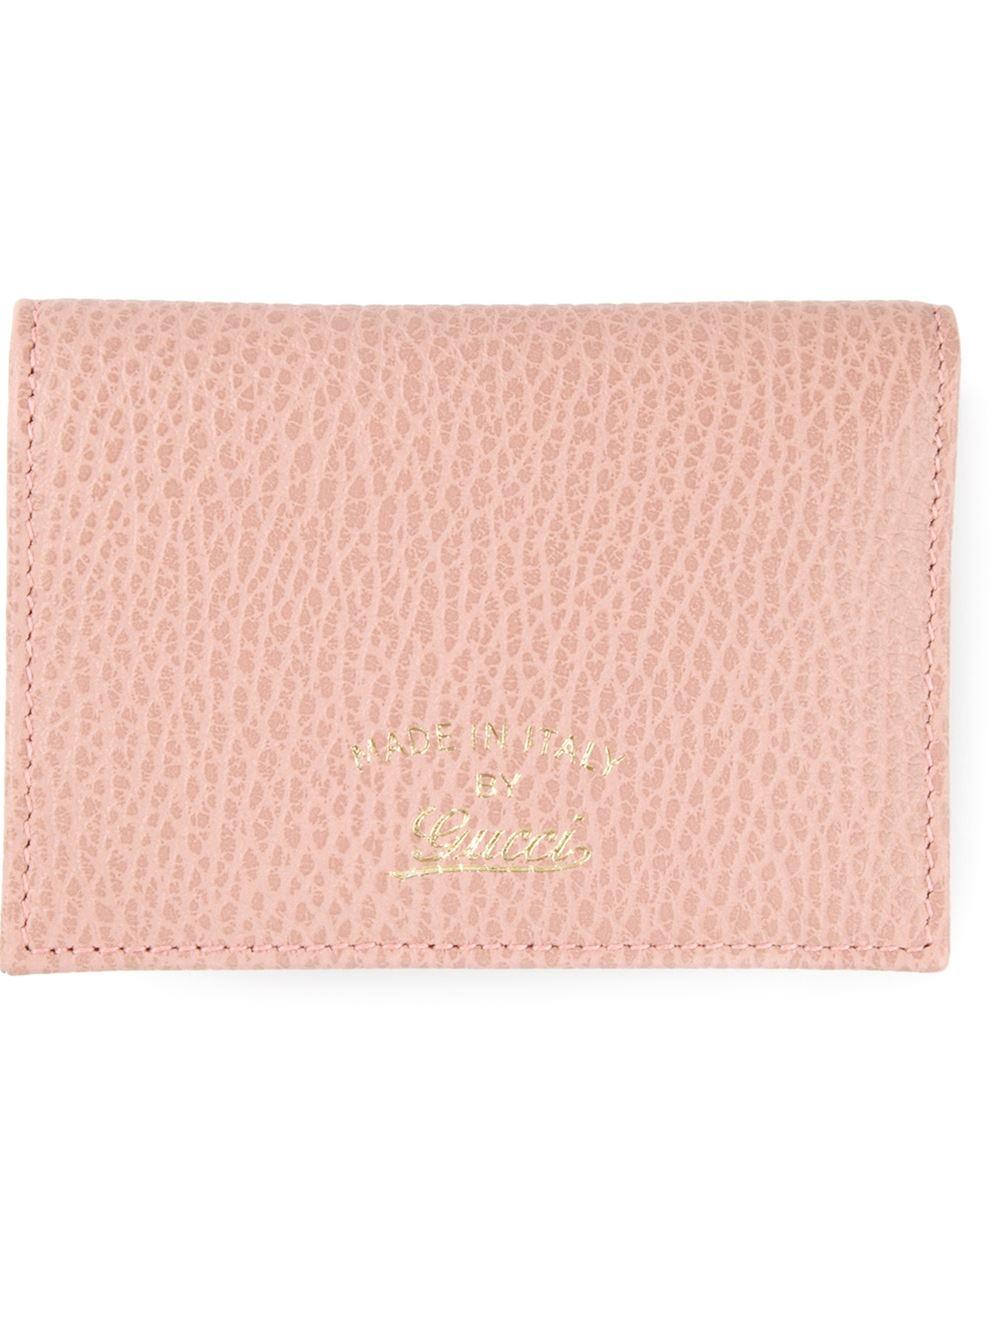 65c5c4a3ff96b Lyst - Gucci Classic Card Holder in Pink